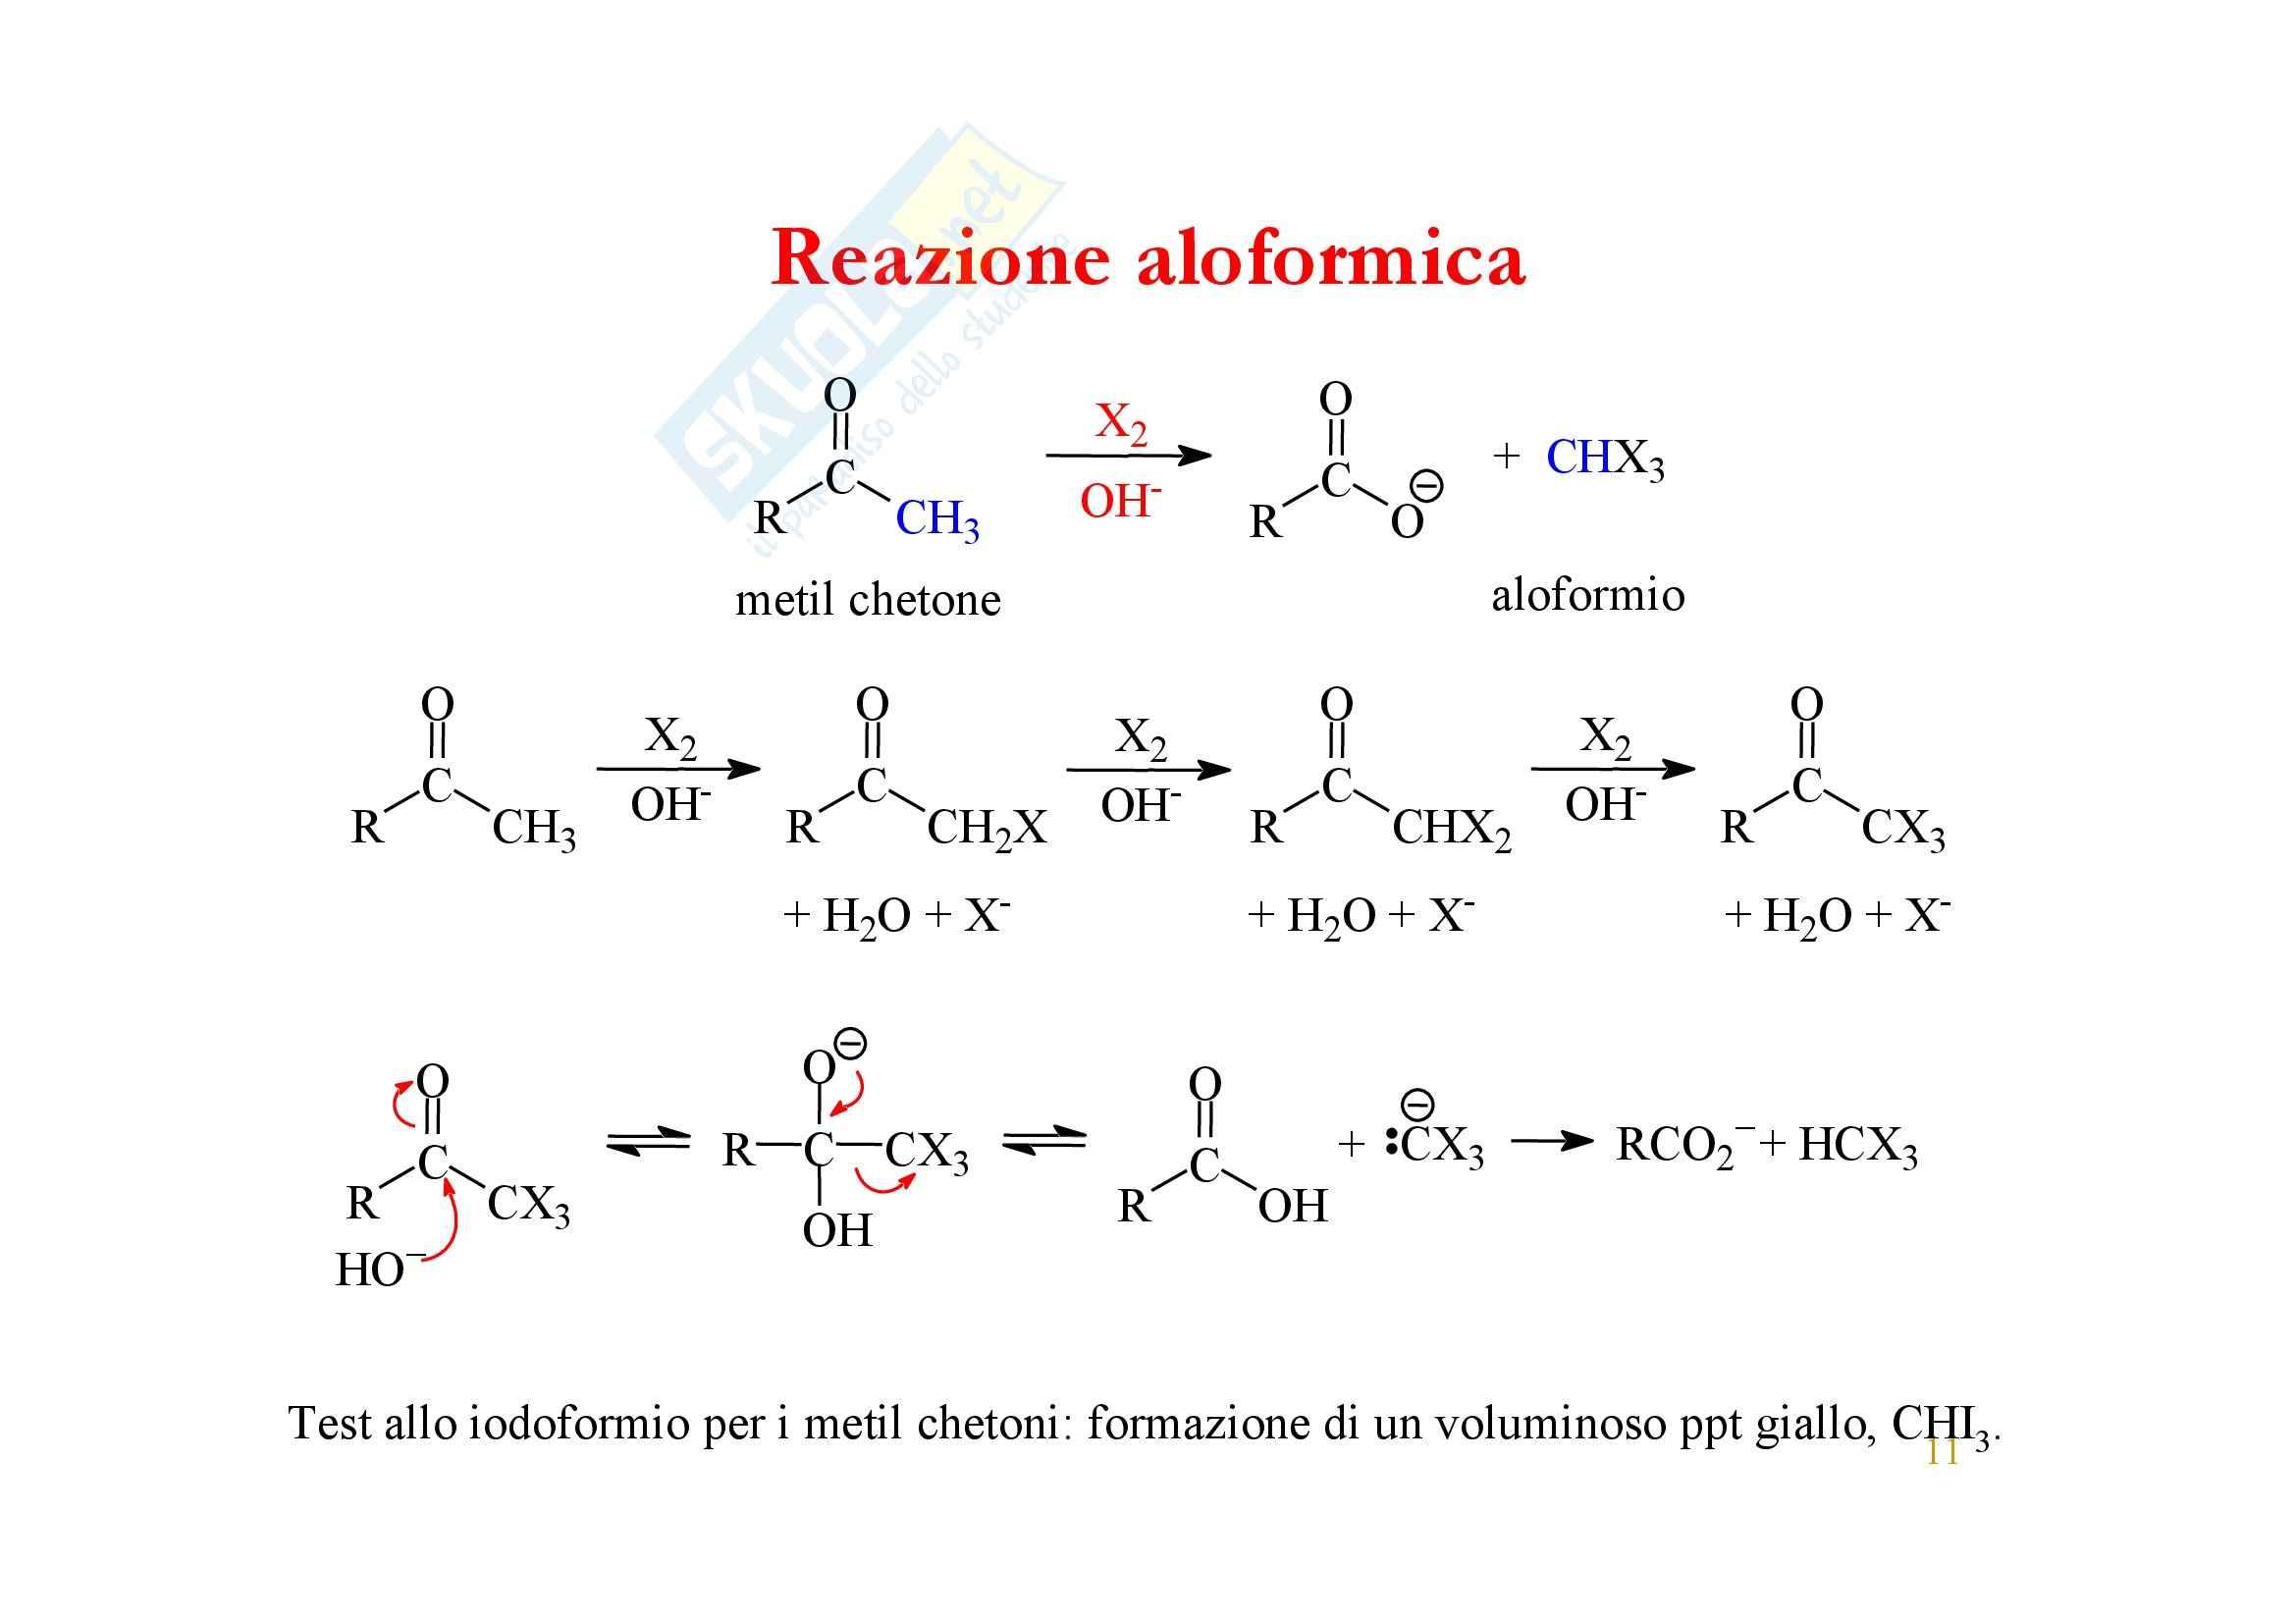 Chimica organica - enoli ed enolati Pag. 11